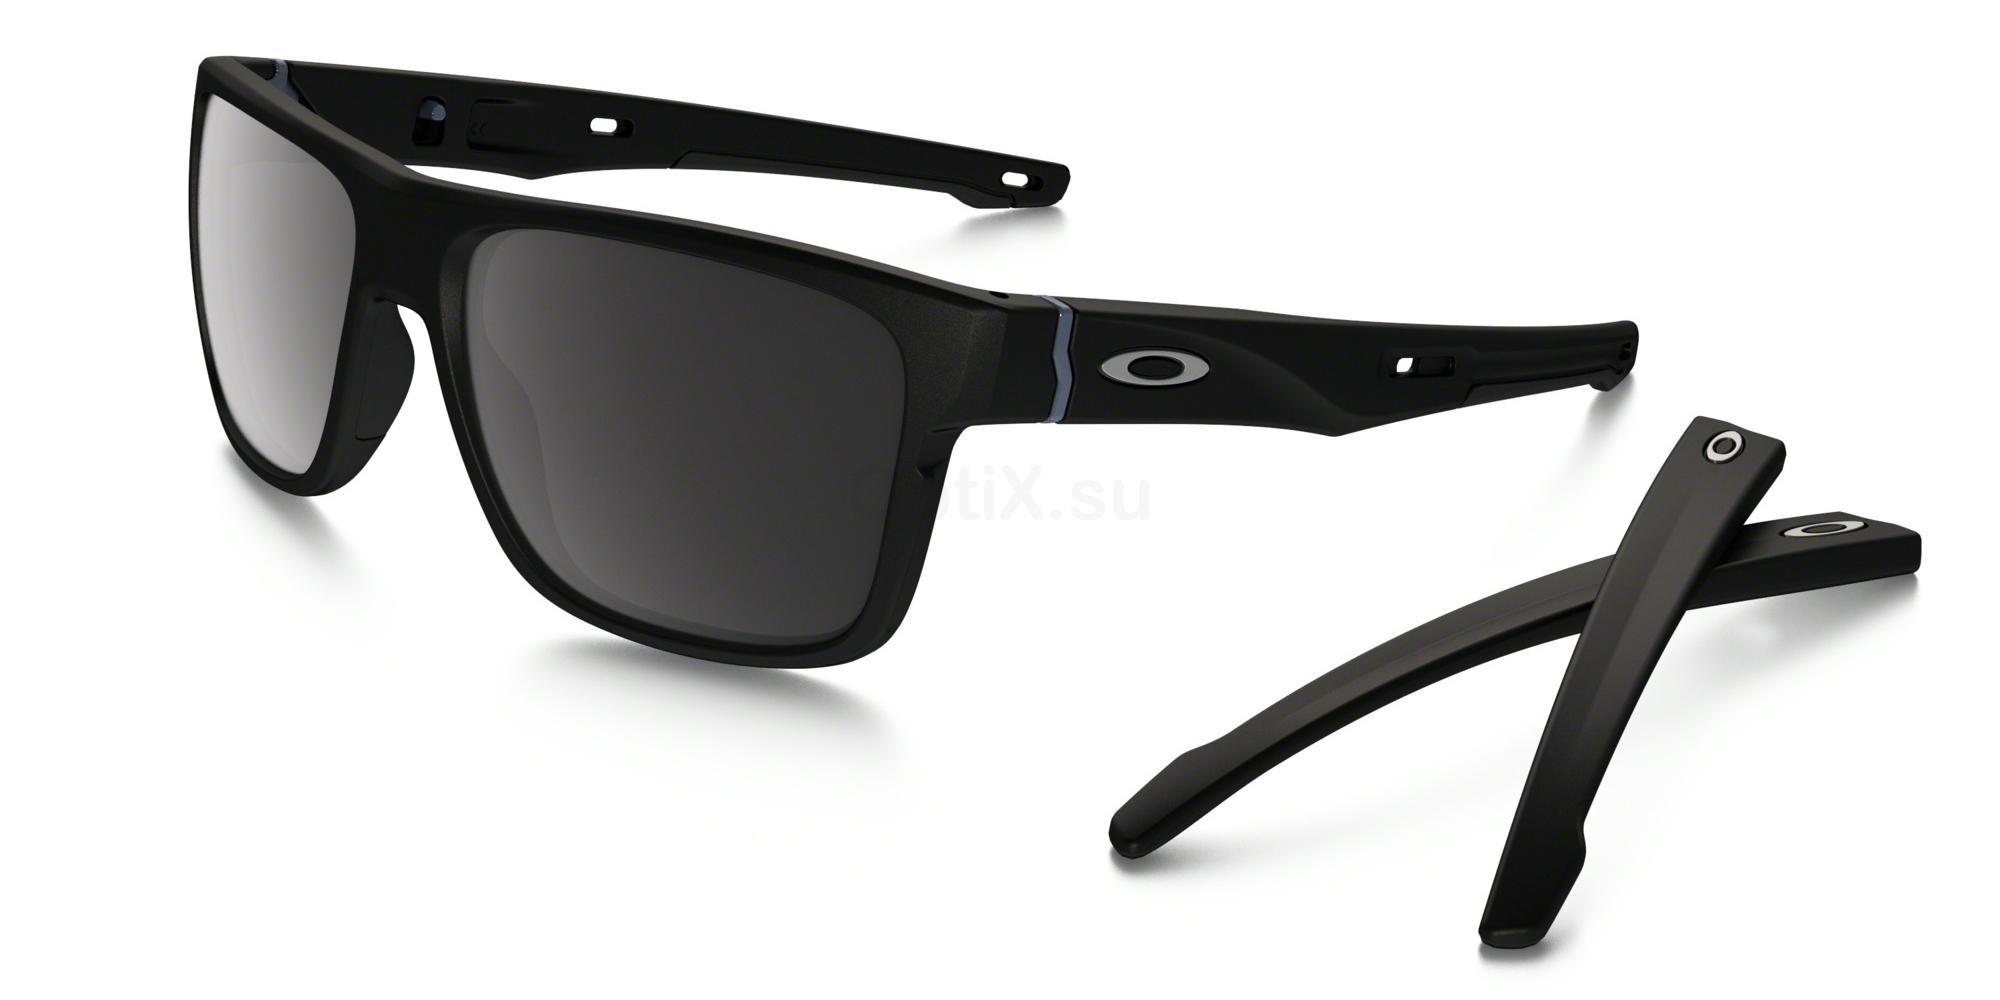 936106 OO9361 CROSSRANGE Sunglasses, Oakley